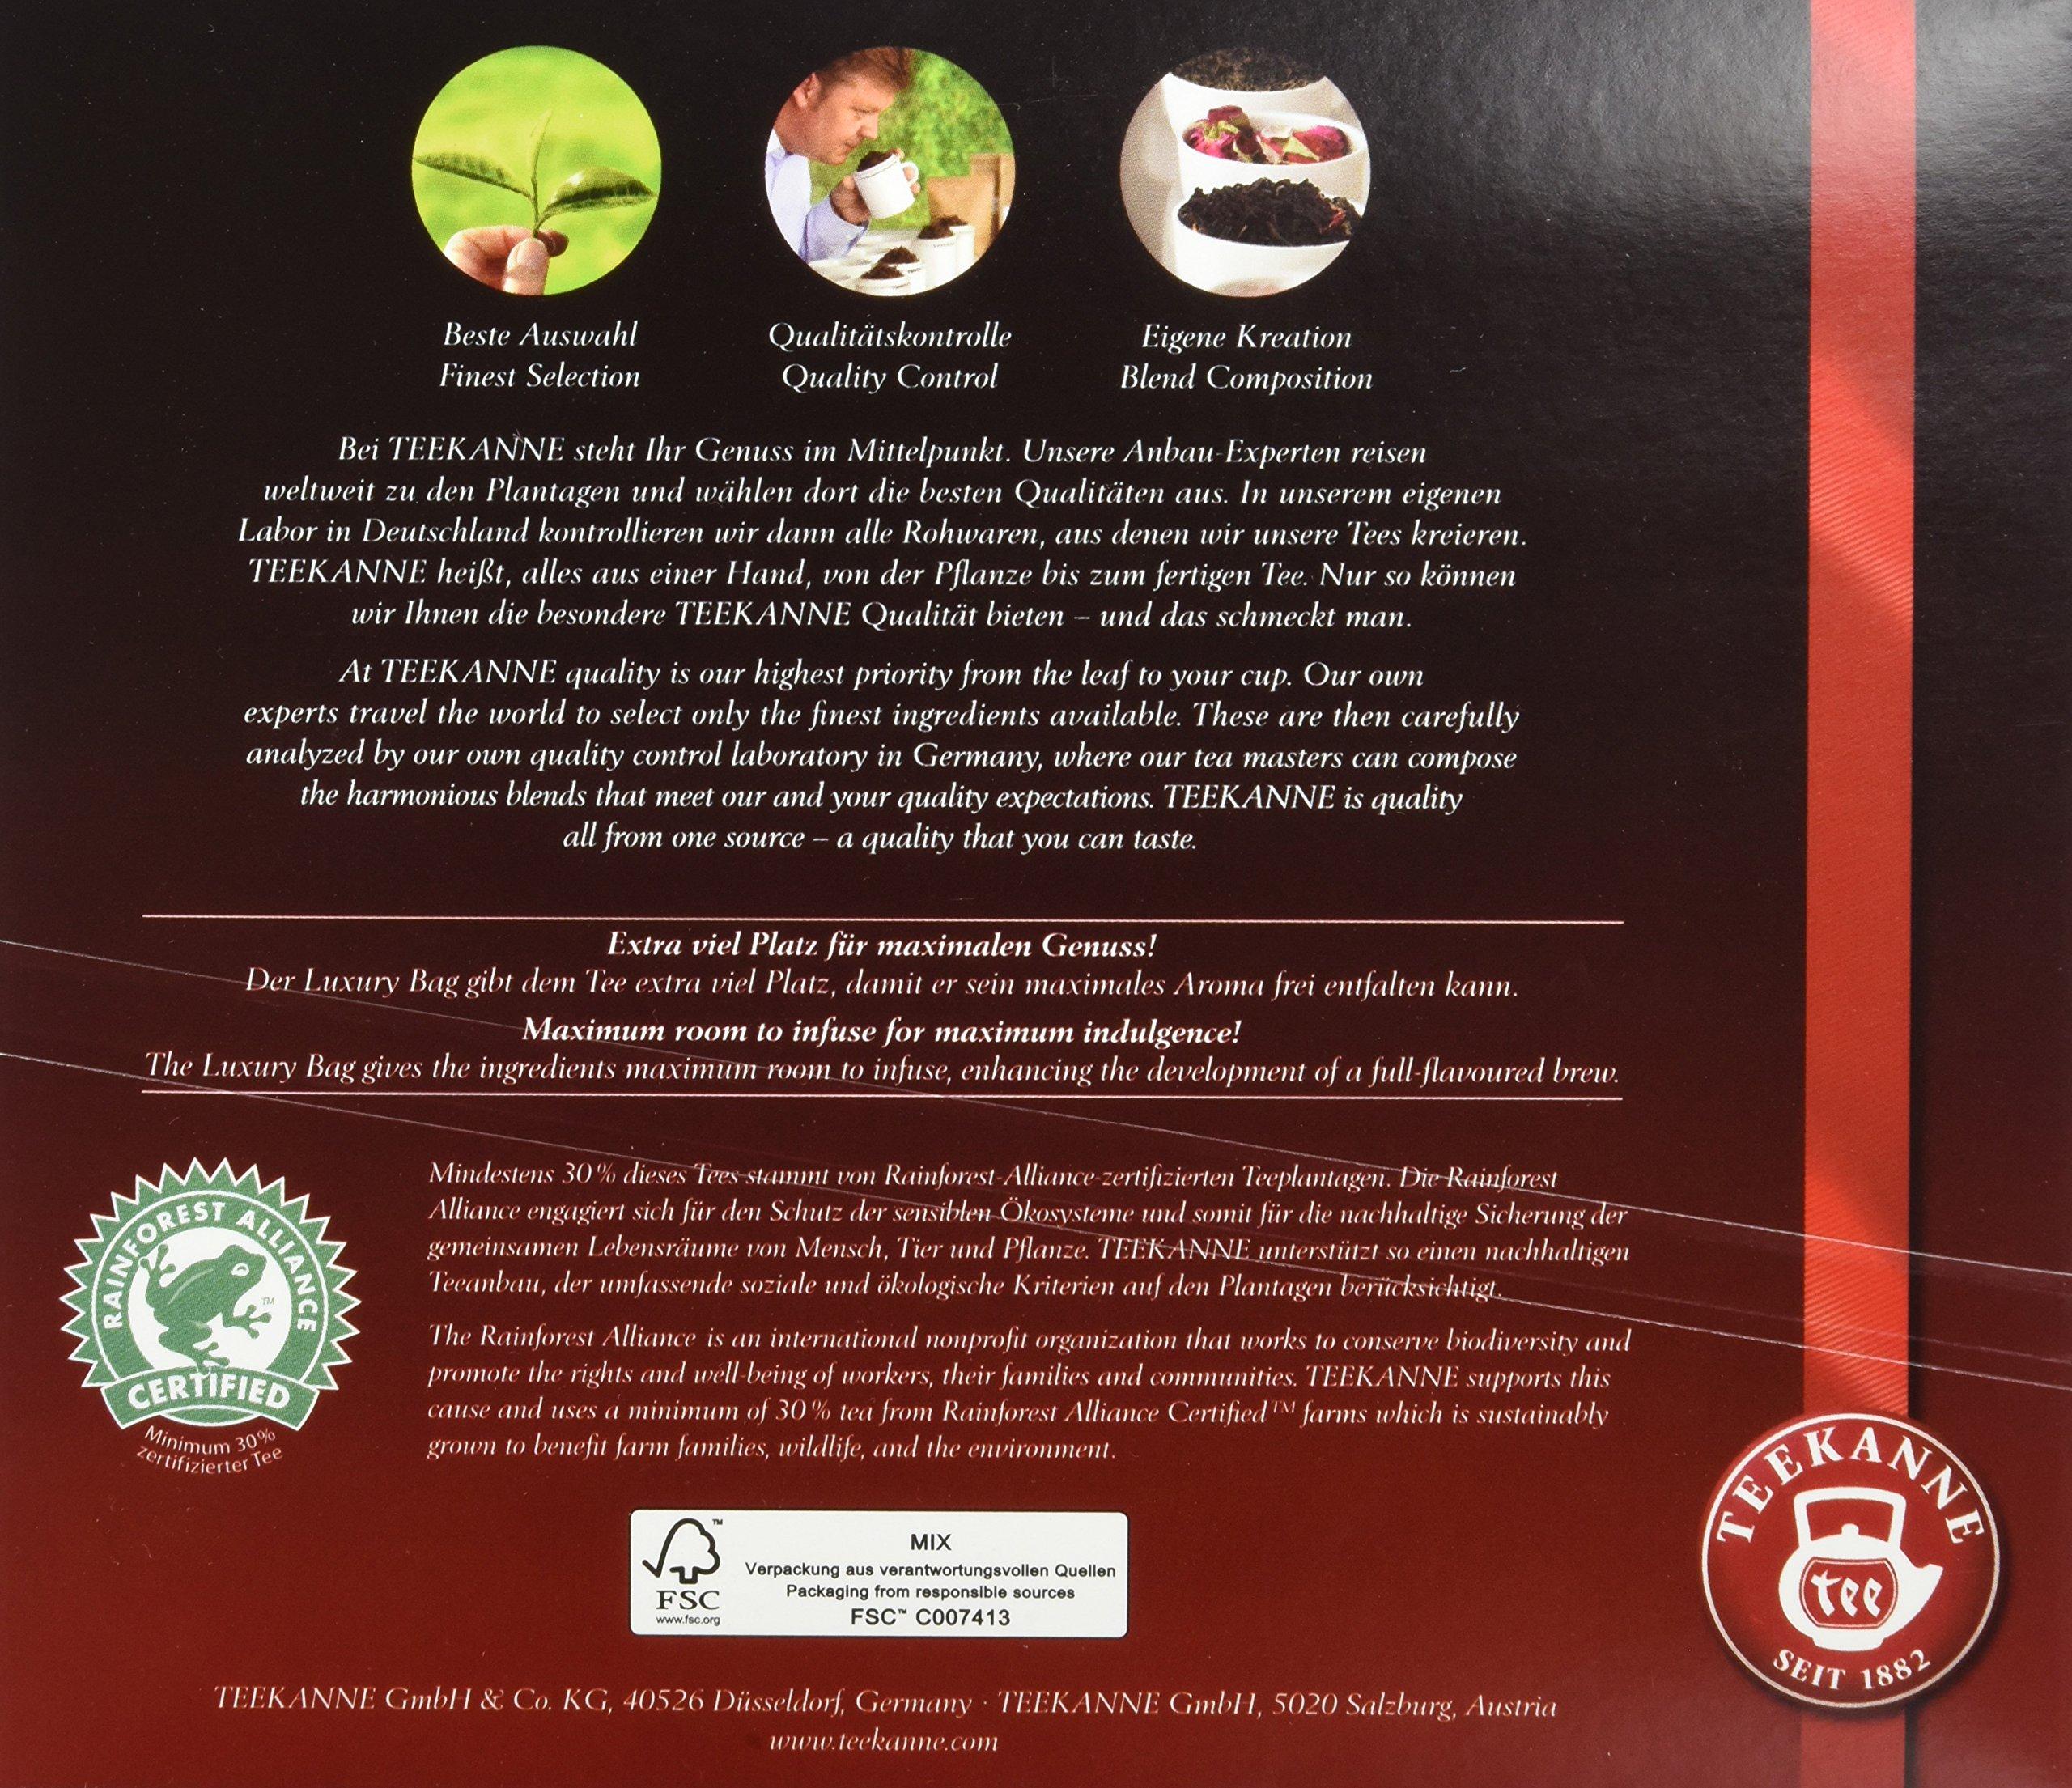 Teekanne-Selection-1882-im-Luxury-Bag-Darjeeling-zart-blumig-20-Portionen-1er-Pack-1-x-80-g